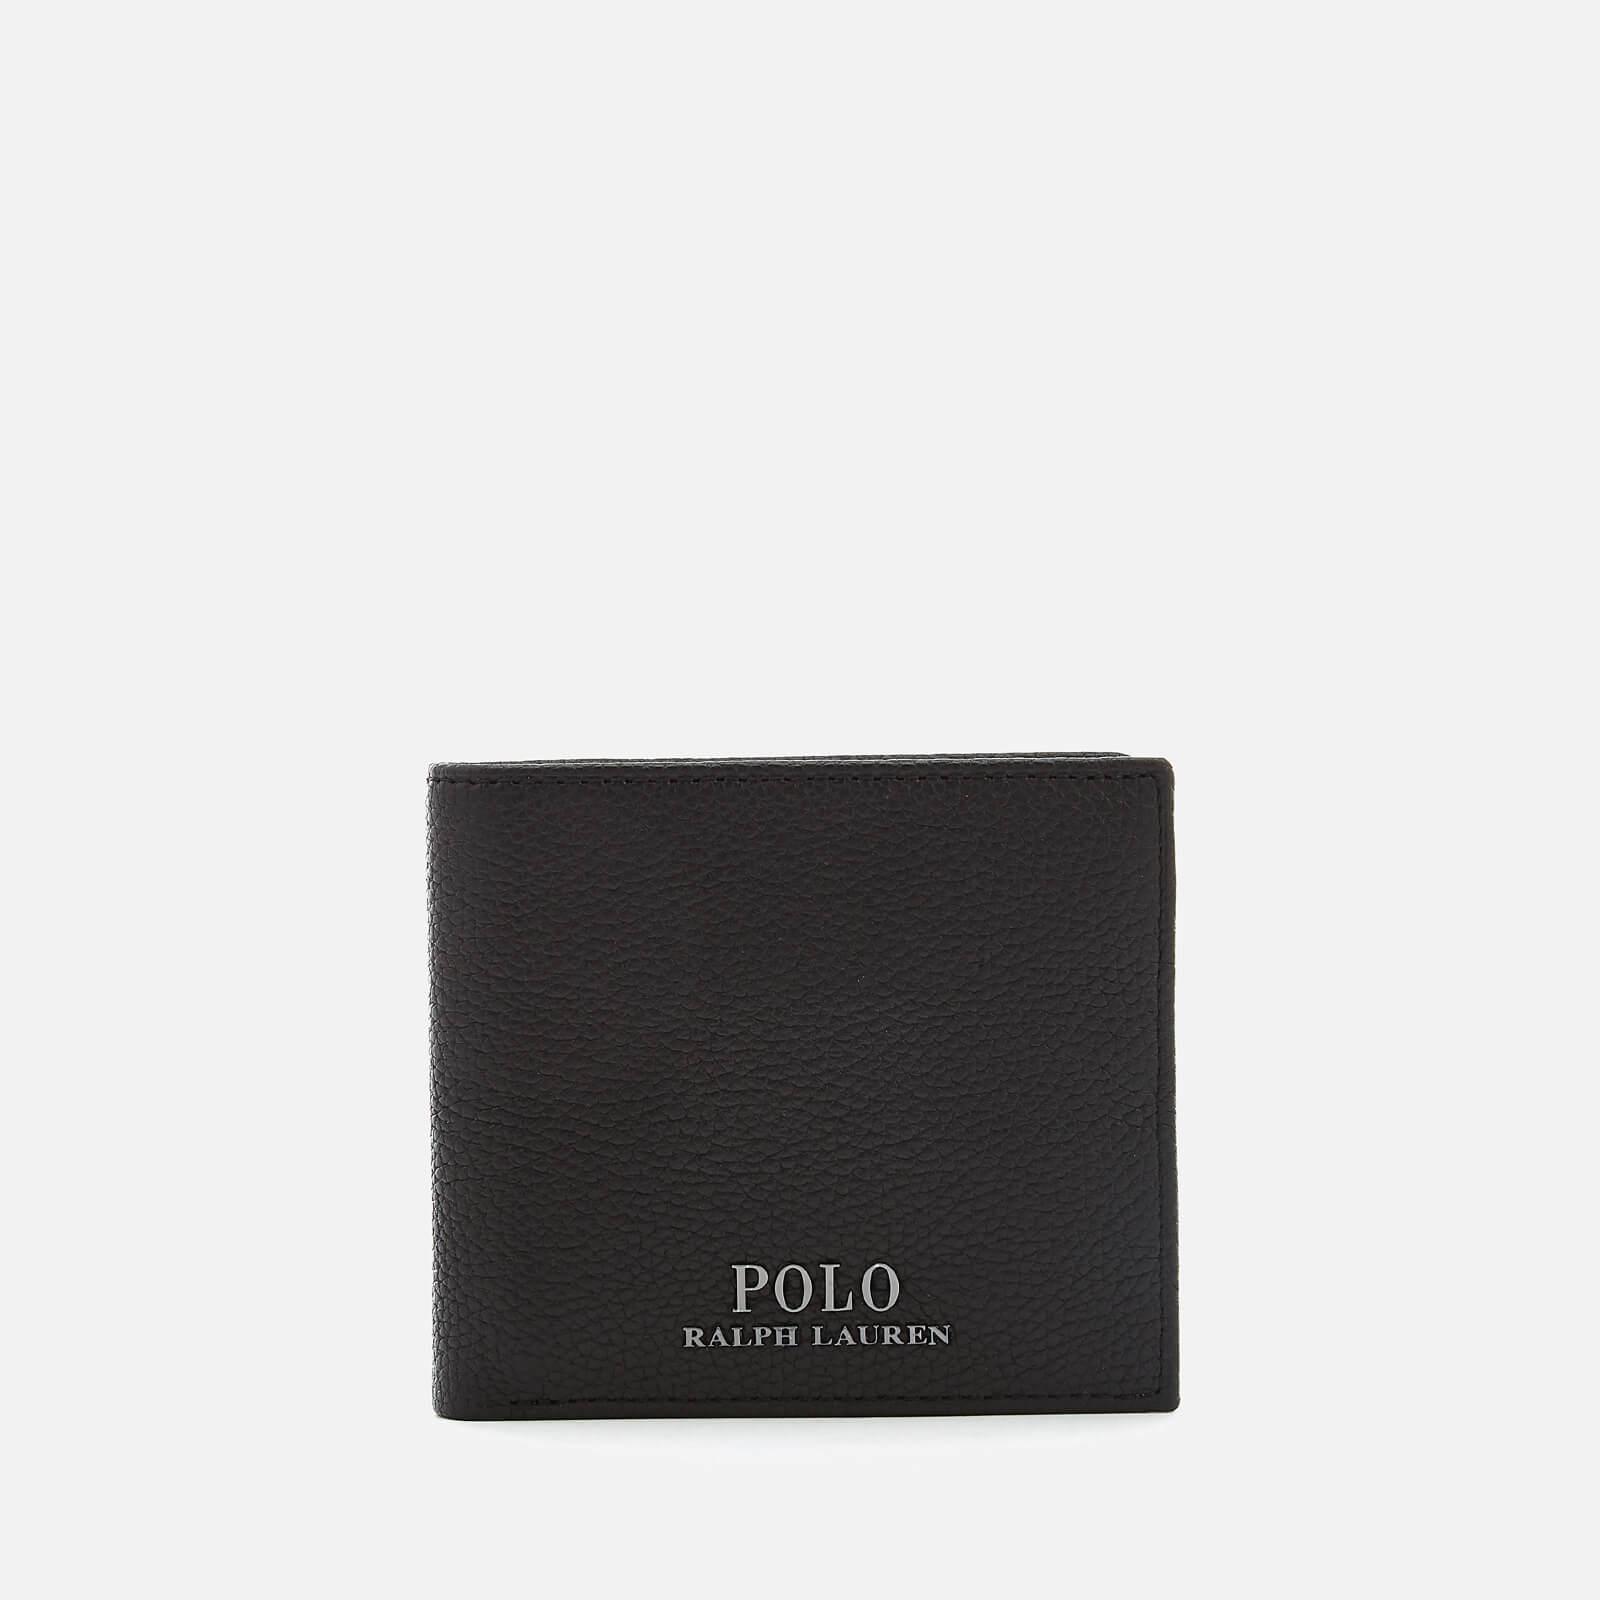 677a1342c330 Polo Ralph Lauren Men's PRL Leather Billfold Wallet - Black - Free ...